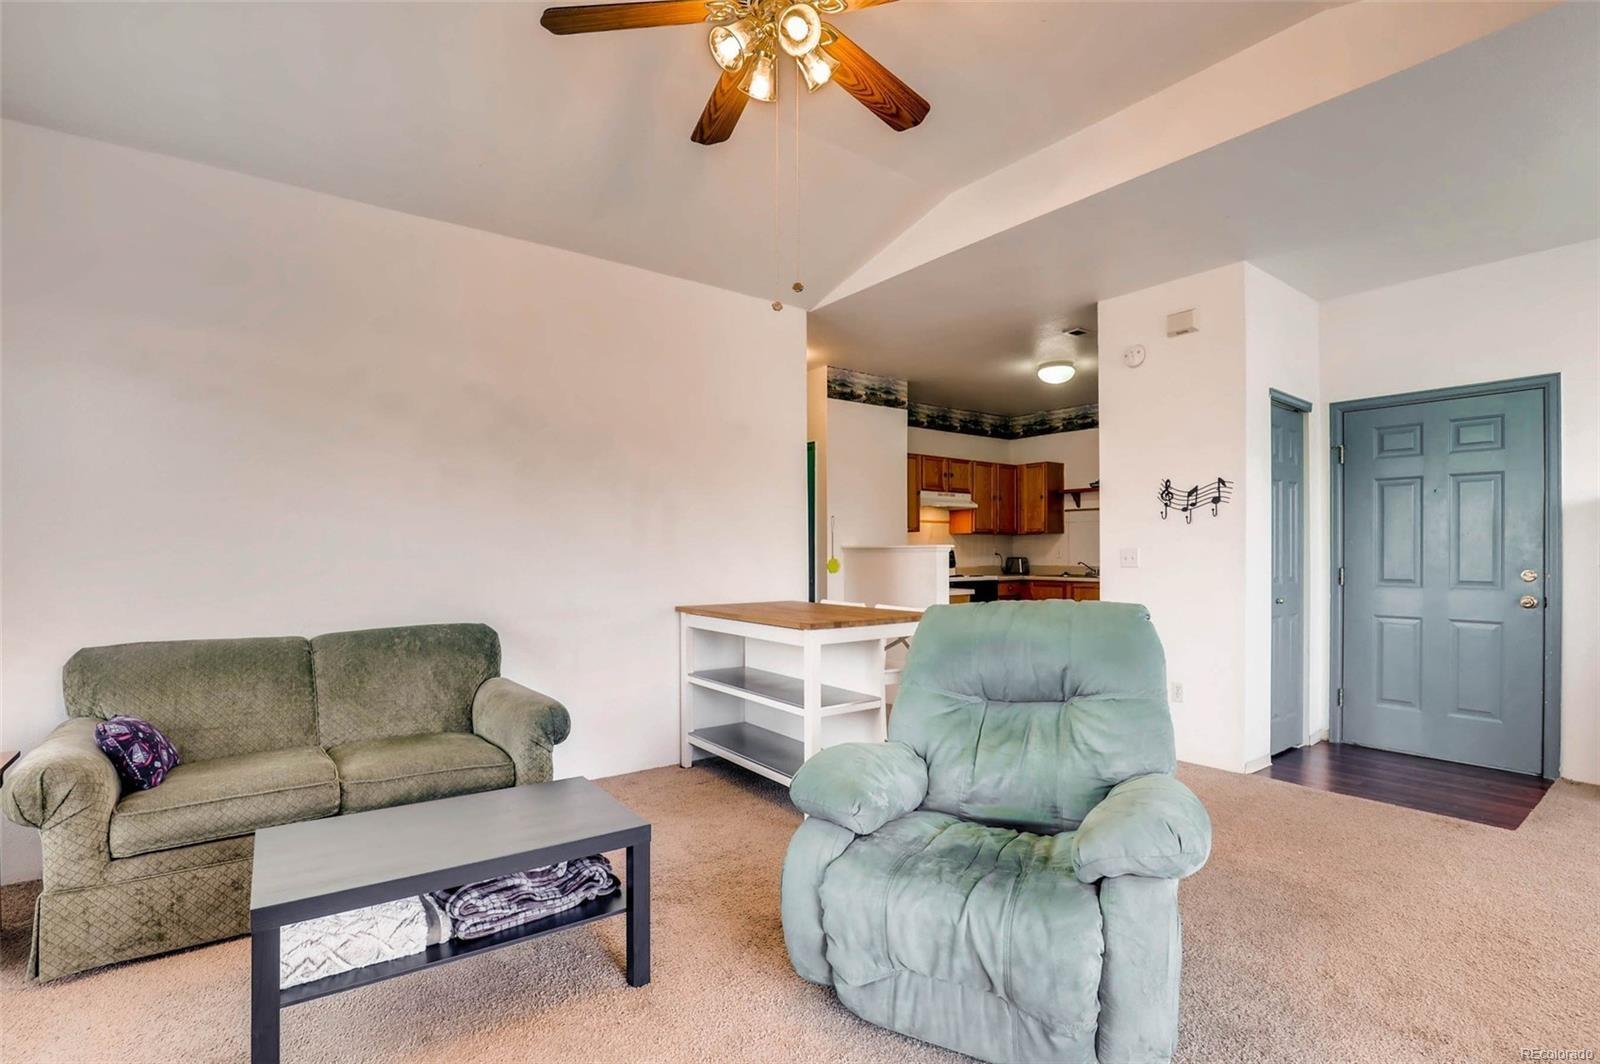 MLS# 9808696 - 14 - 2049 Legacy Ridge View, Colorado Springs, CO 80910